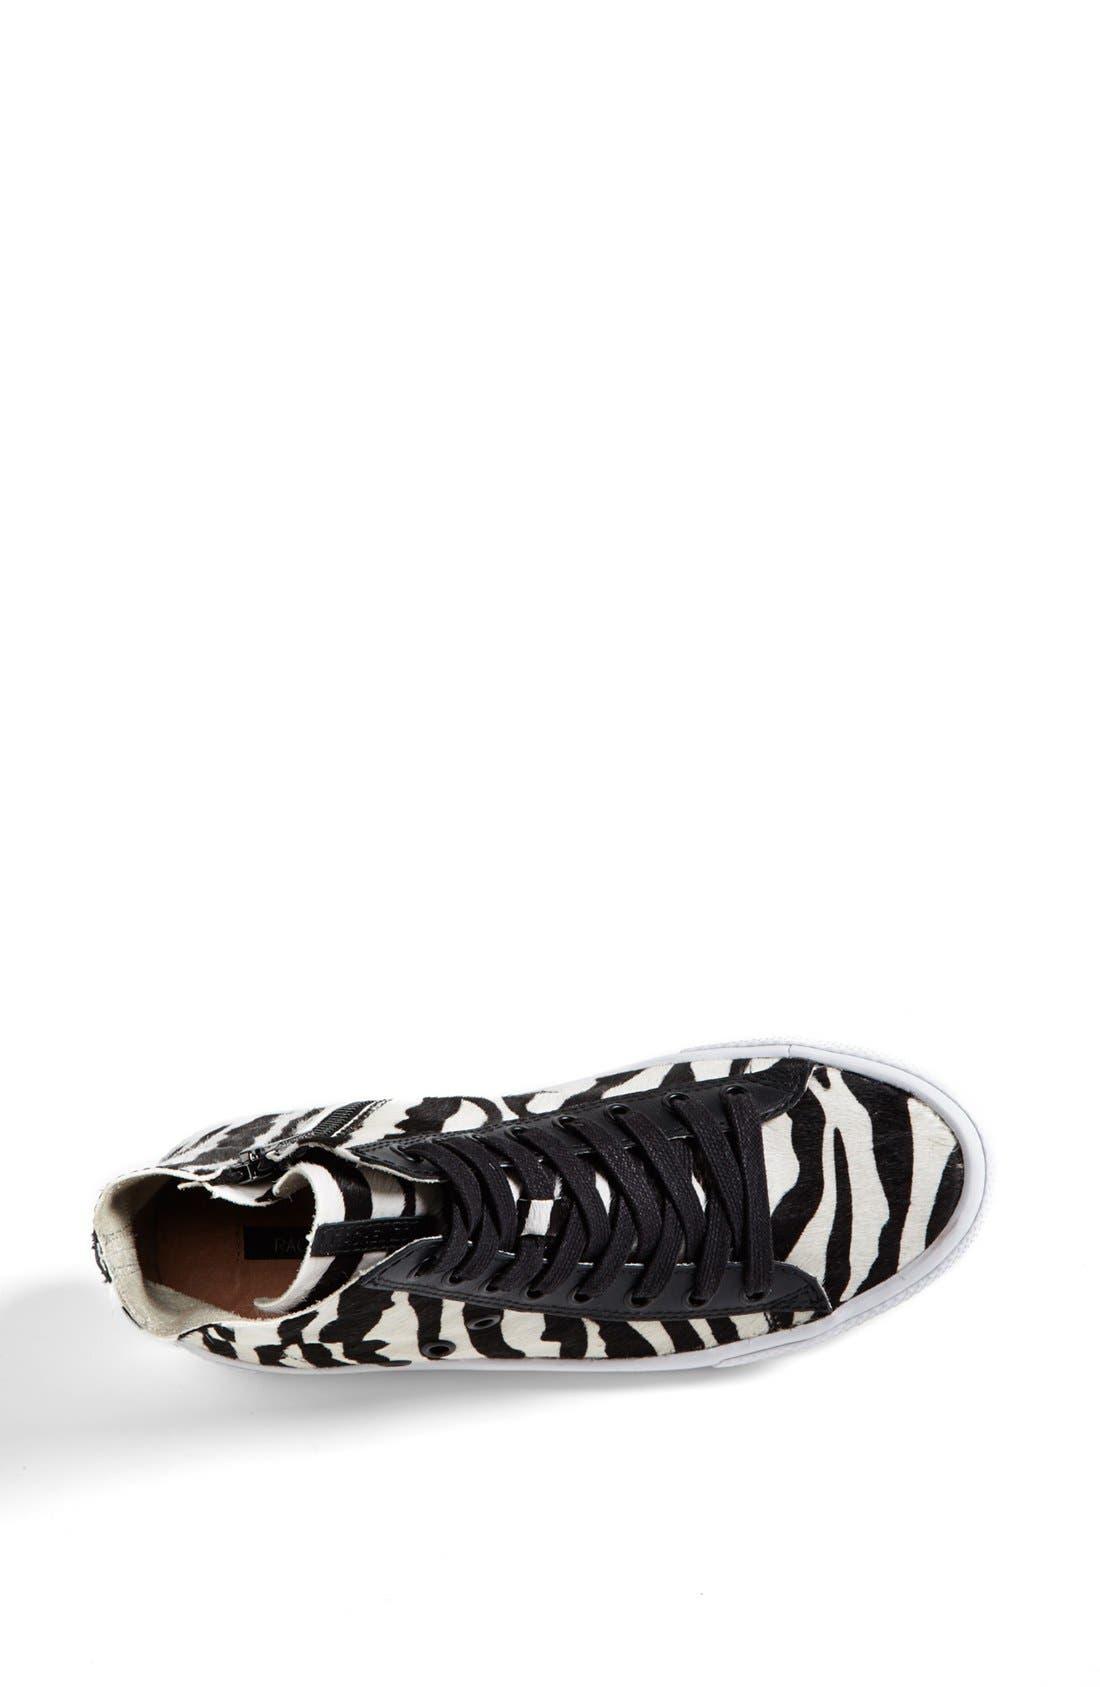 Alternate Image 3  - Rachel Zoe 'Barret' Zebra Print Calf Hair Sneaker (Online Only)